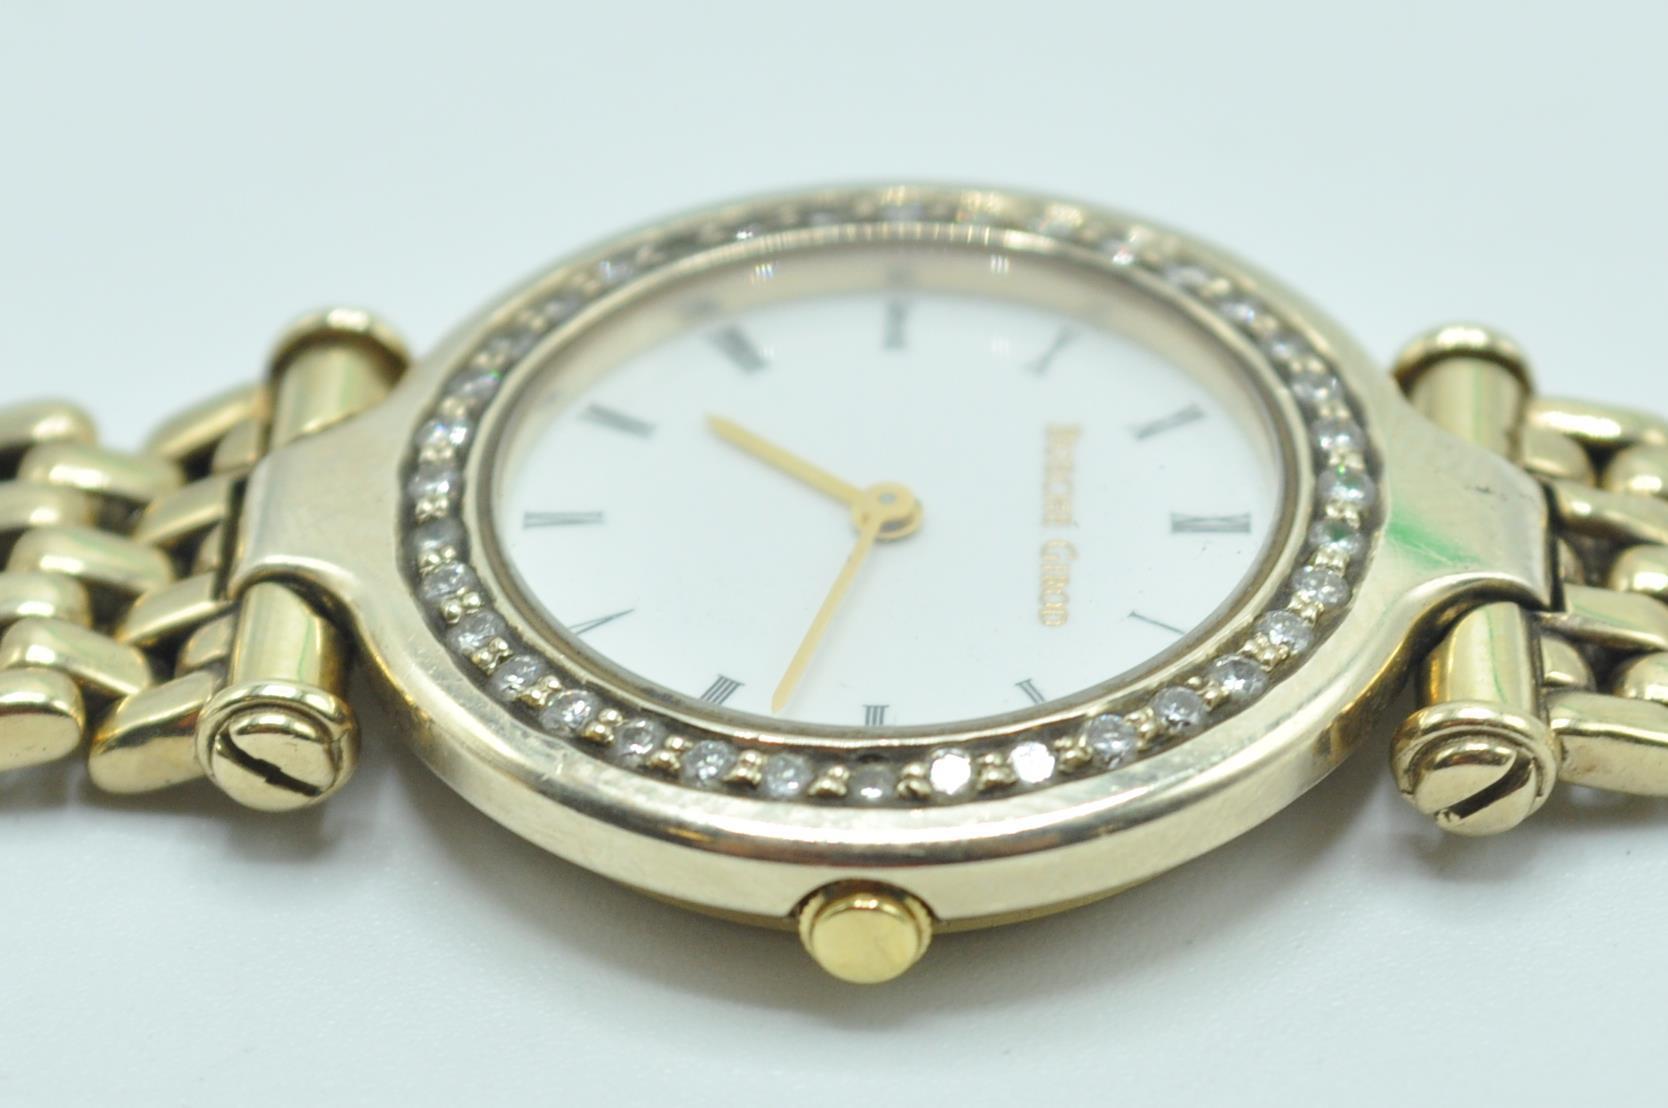 BUECHE GIROD 9CT GOLD AND DIAMOND WRIST WATCH - Image 7 of 8